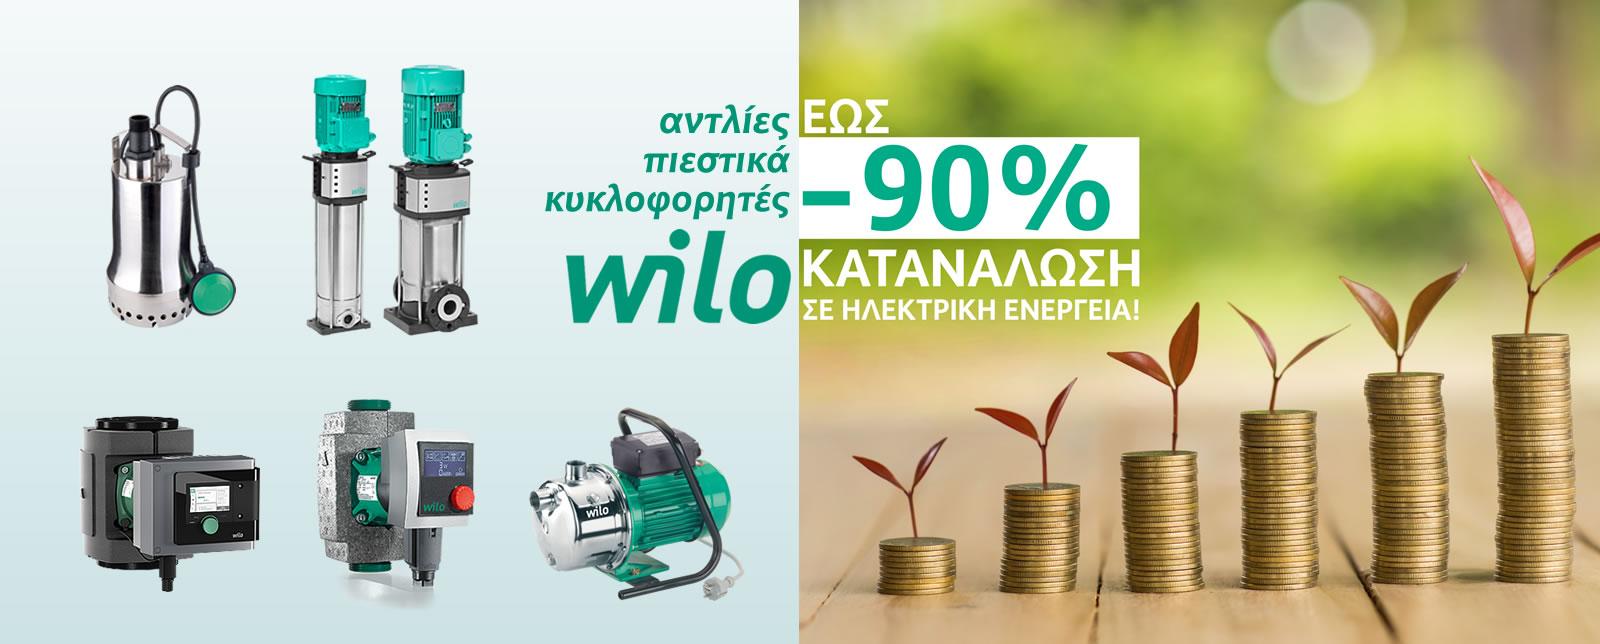 Wilo αντλίες - πιεστικά -κυκλοφορητές - Ν.Ι.Α. ΣΤΑΘΕΡΟΣ